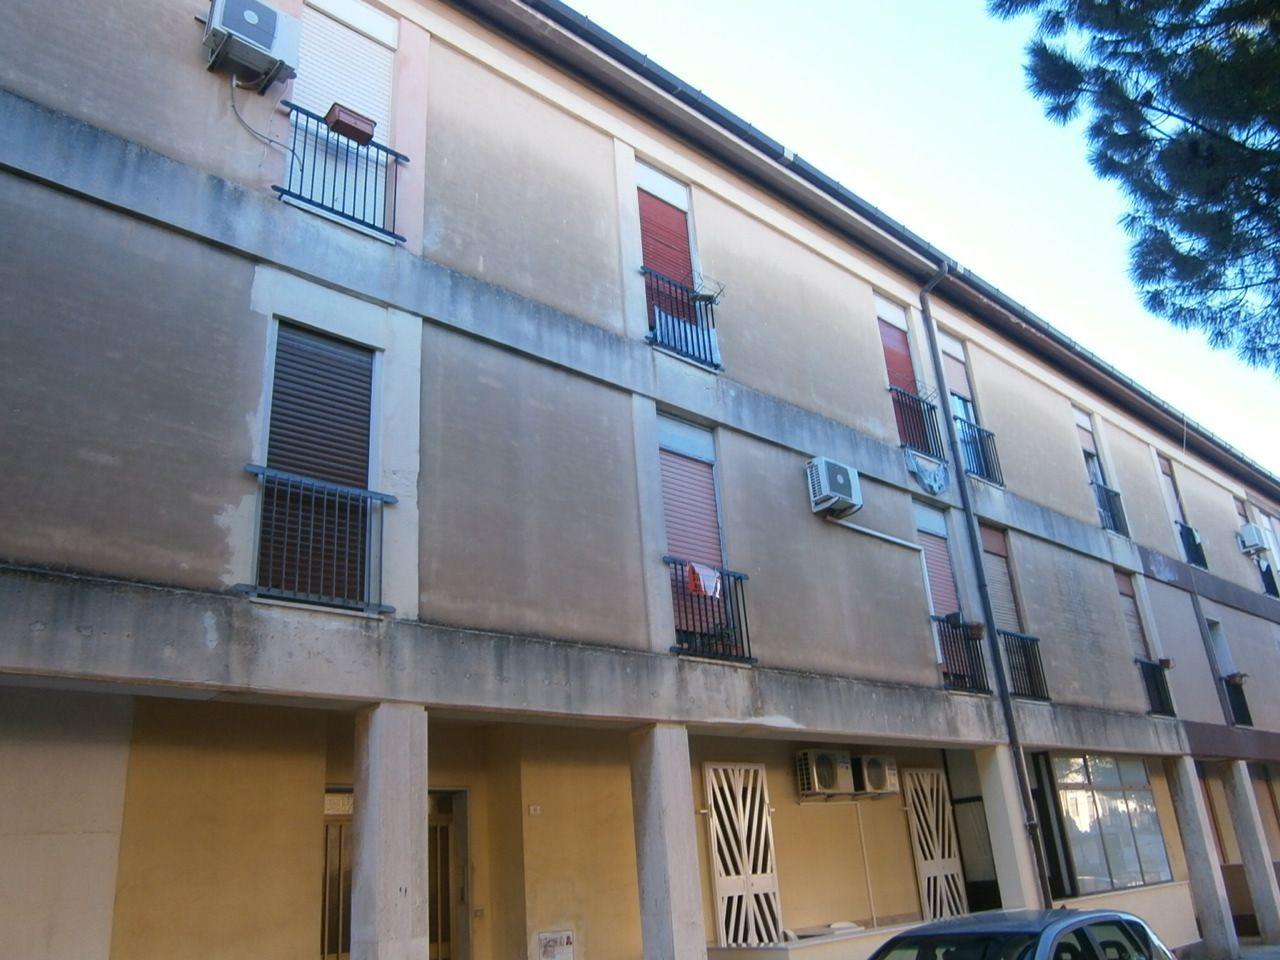 Appartamento - Quadrilocale a PANAGIA, Siracusa